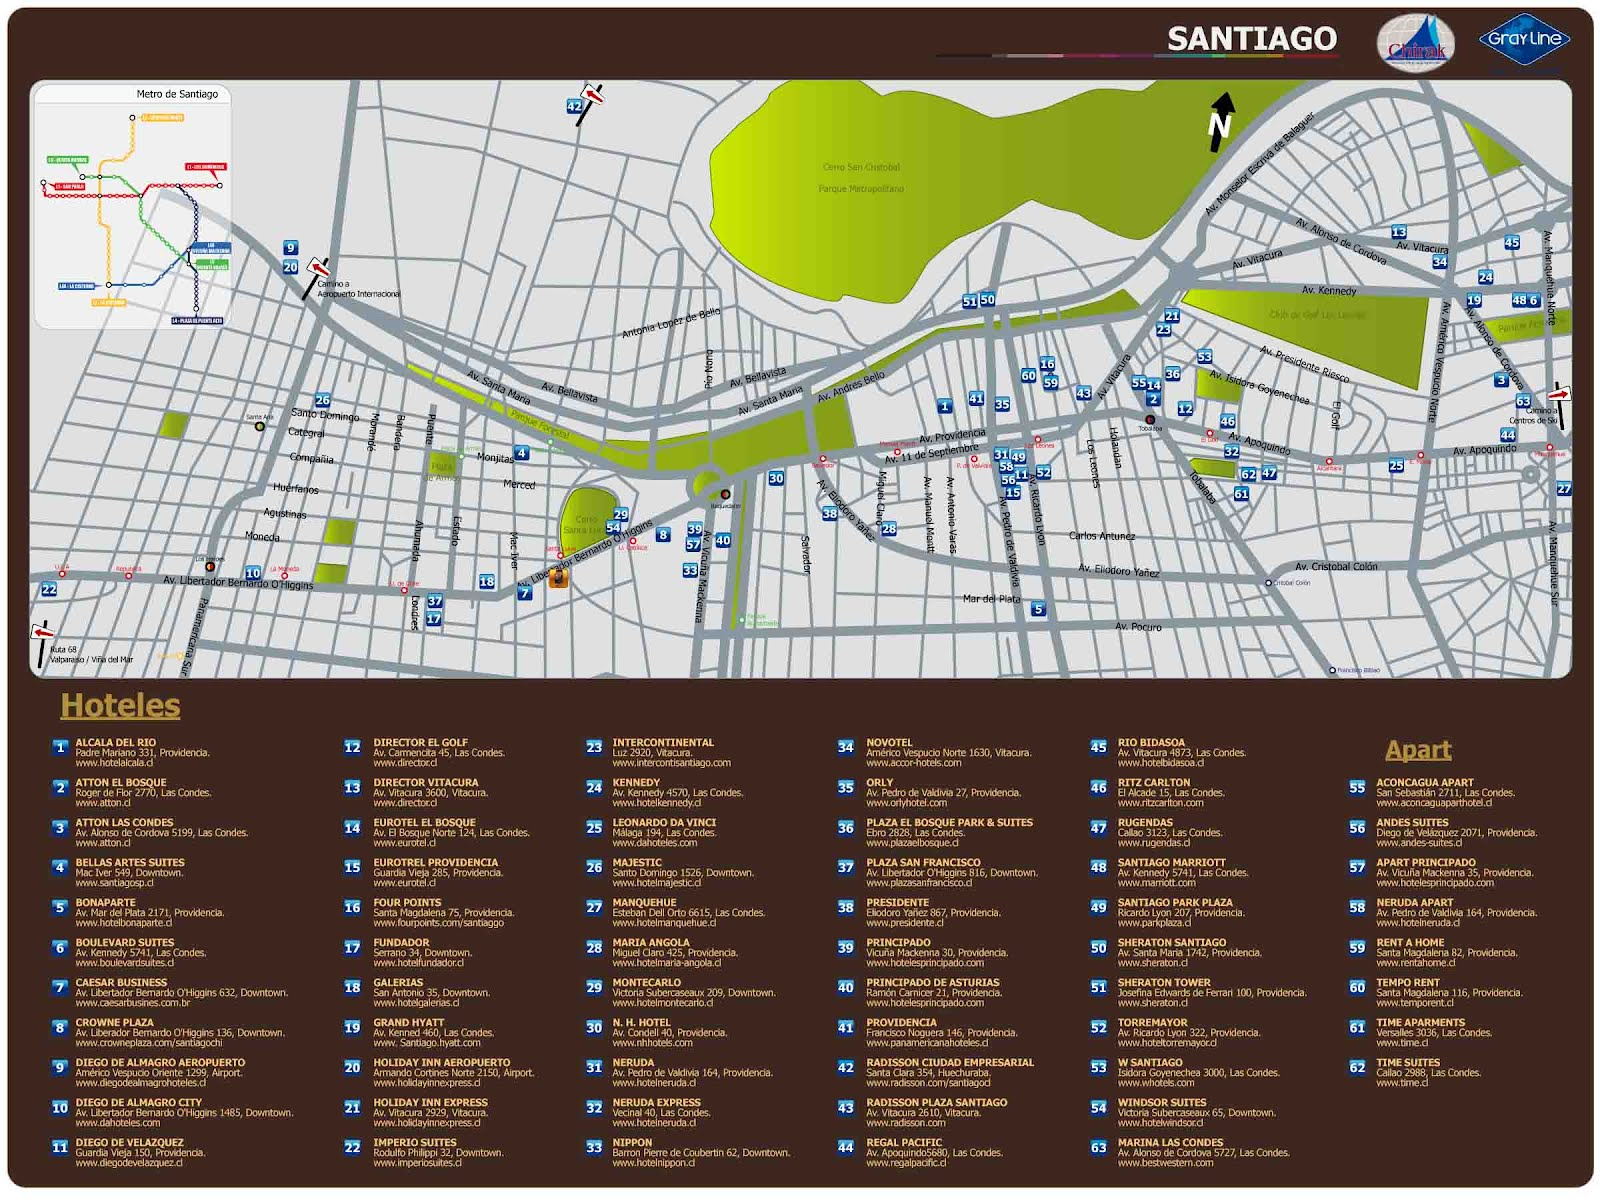 Santiago do chile mapa turistico for Calles de santiago de chile